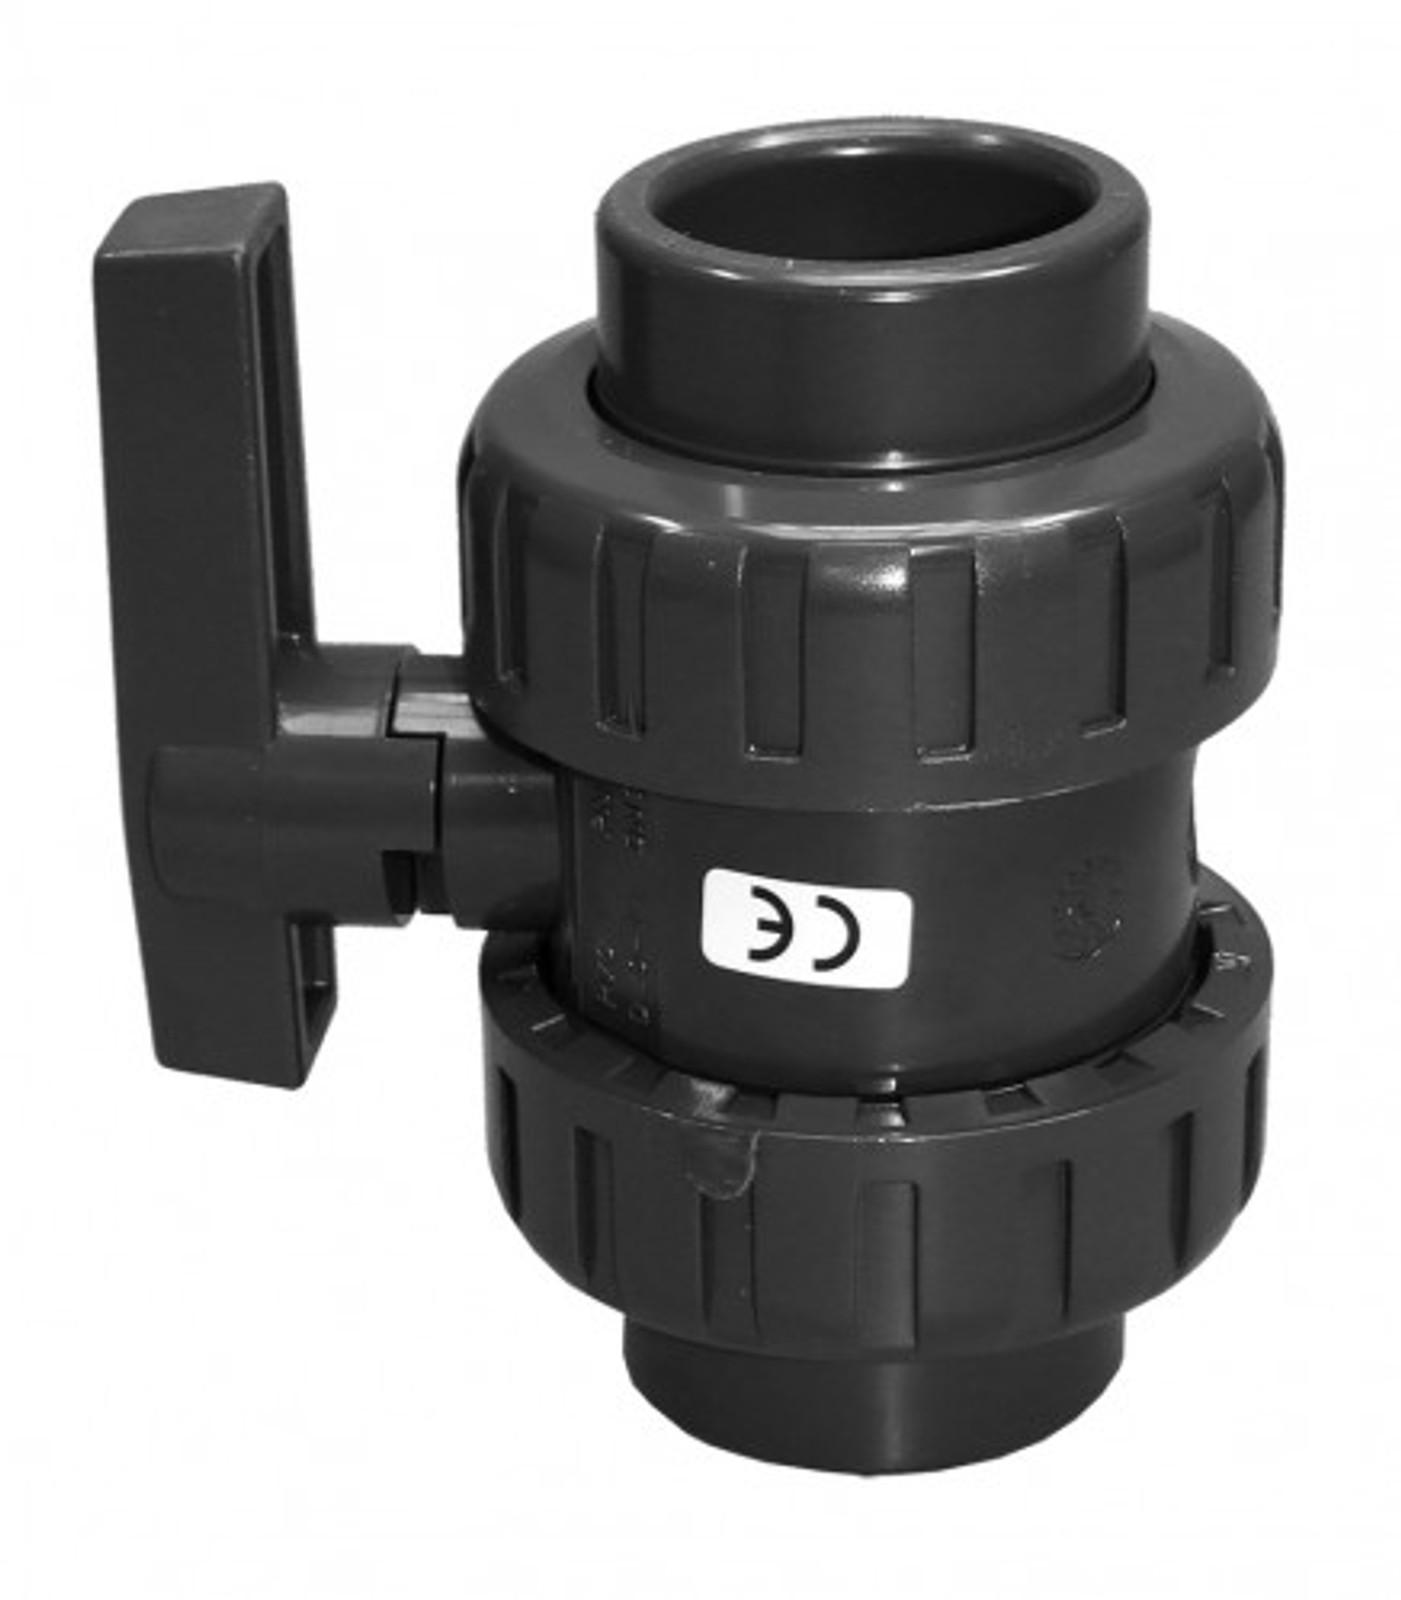 PVC-Kugelhahn m. 2 Anschlußenden, Ø 32 mm